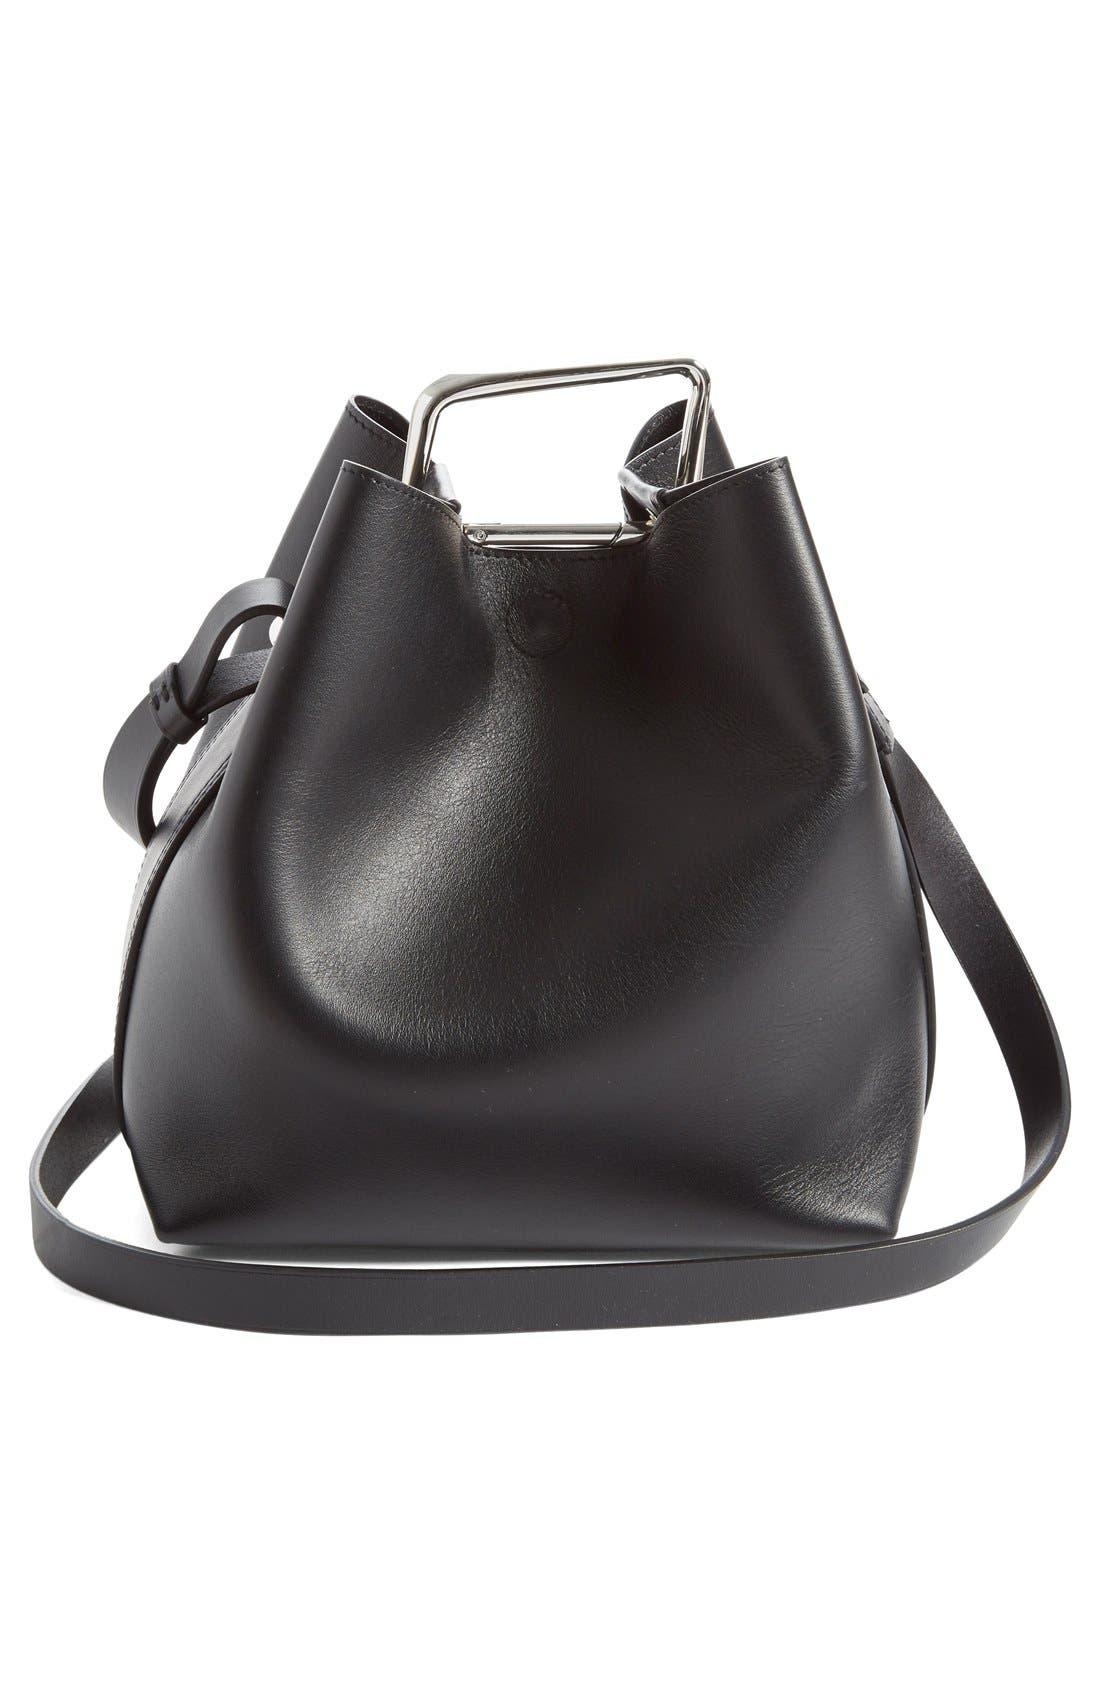 'Mini Quill' Leather Bucket Bag,                             Alternate thumbnail 3, color,                             Black